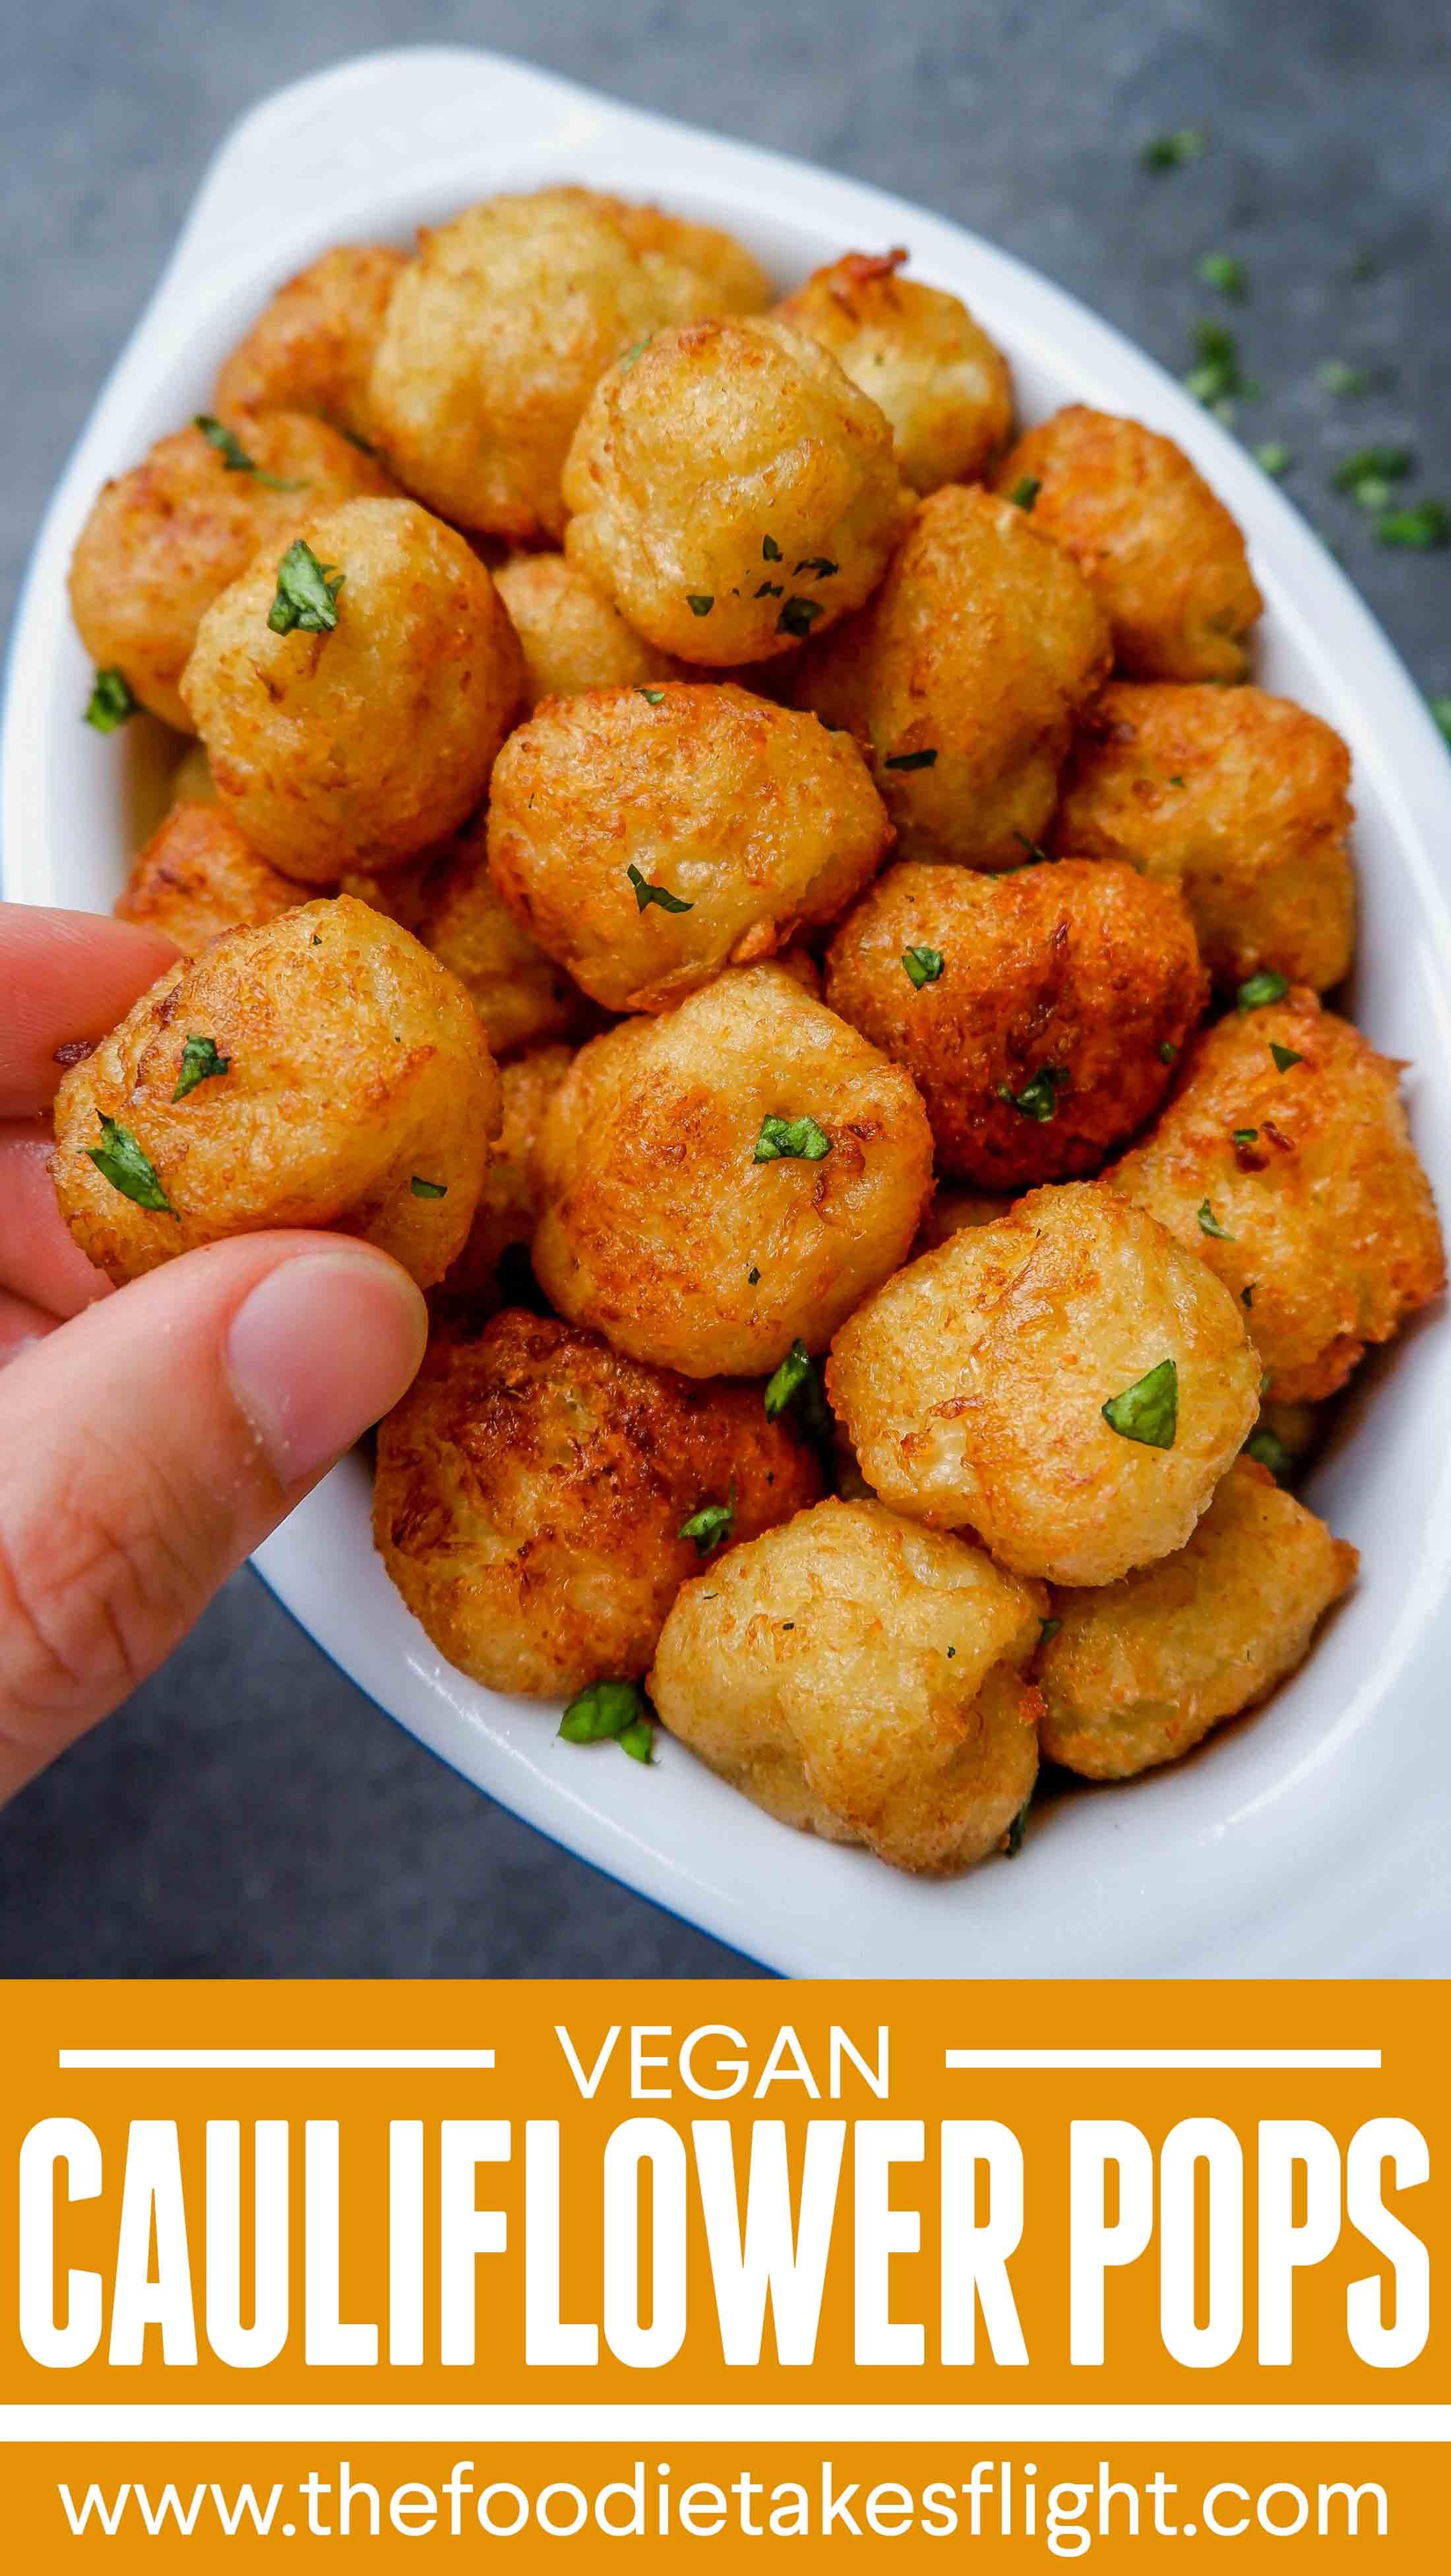 4 Ingredient Cauliflower Pops Vegan Recipe In 2020 Vegan Cauliflower Vegan Recipes Baked Cauliflower Bites